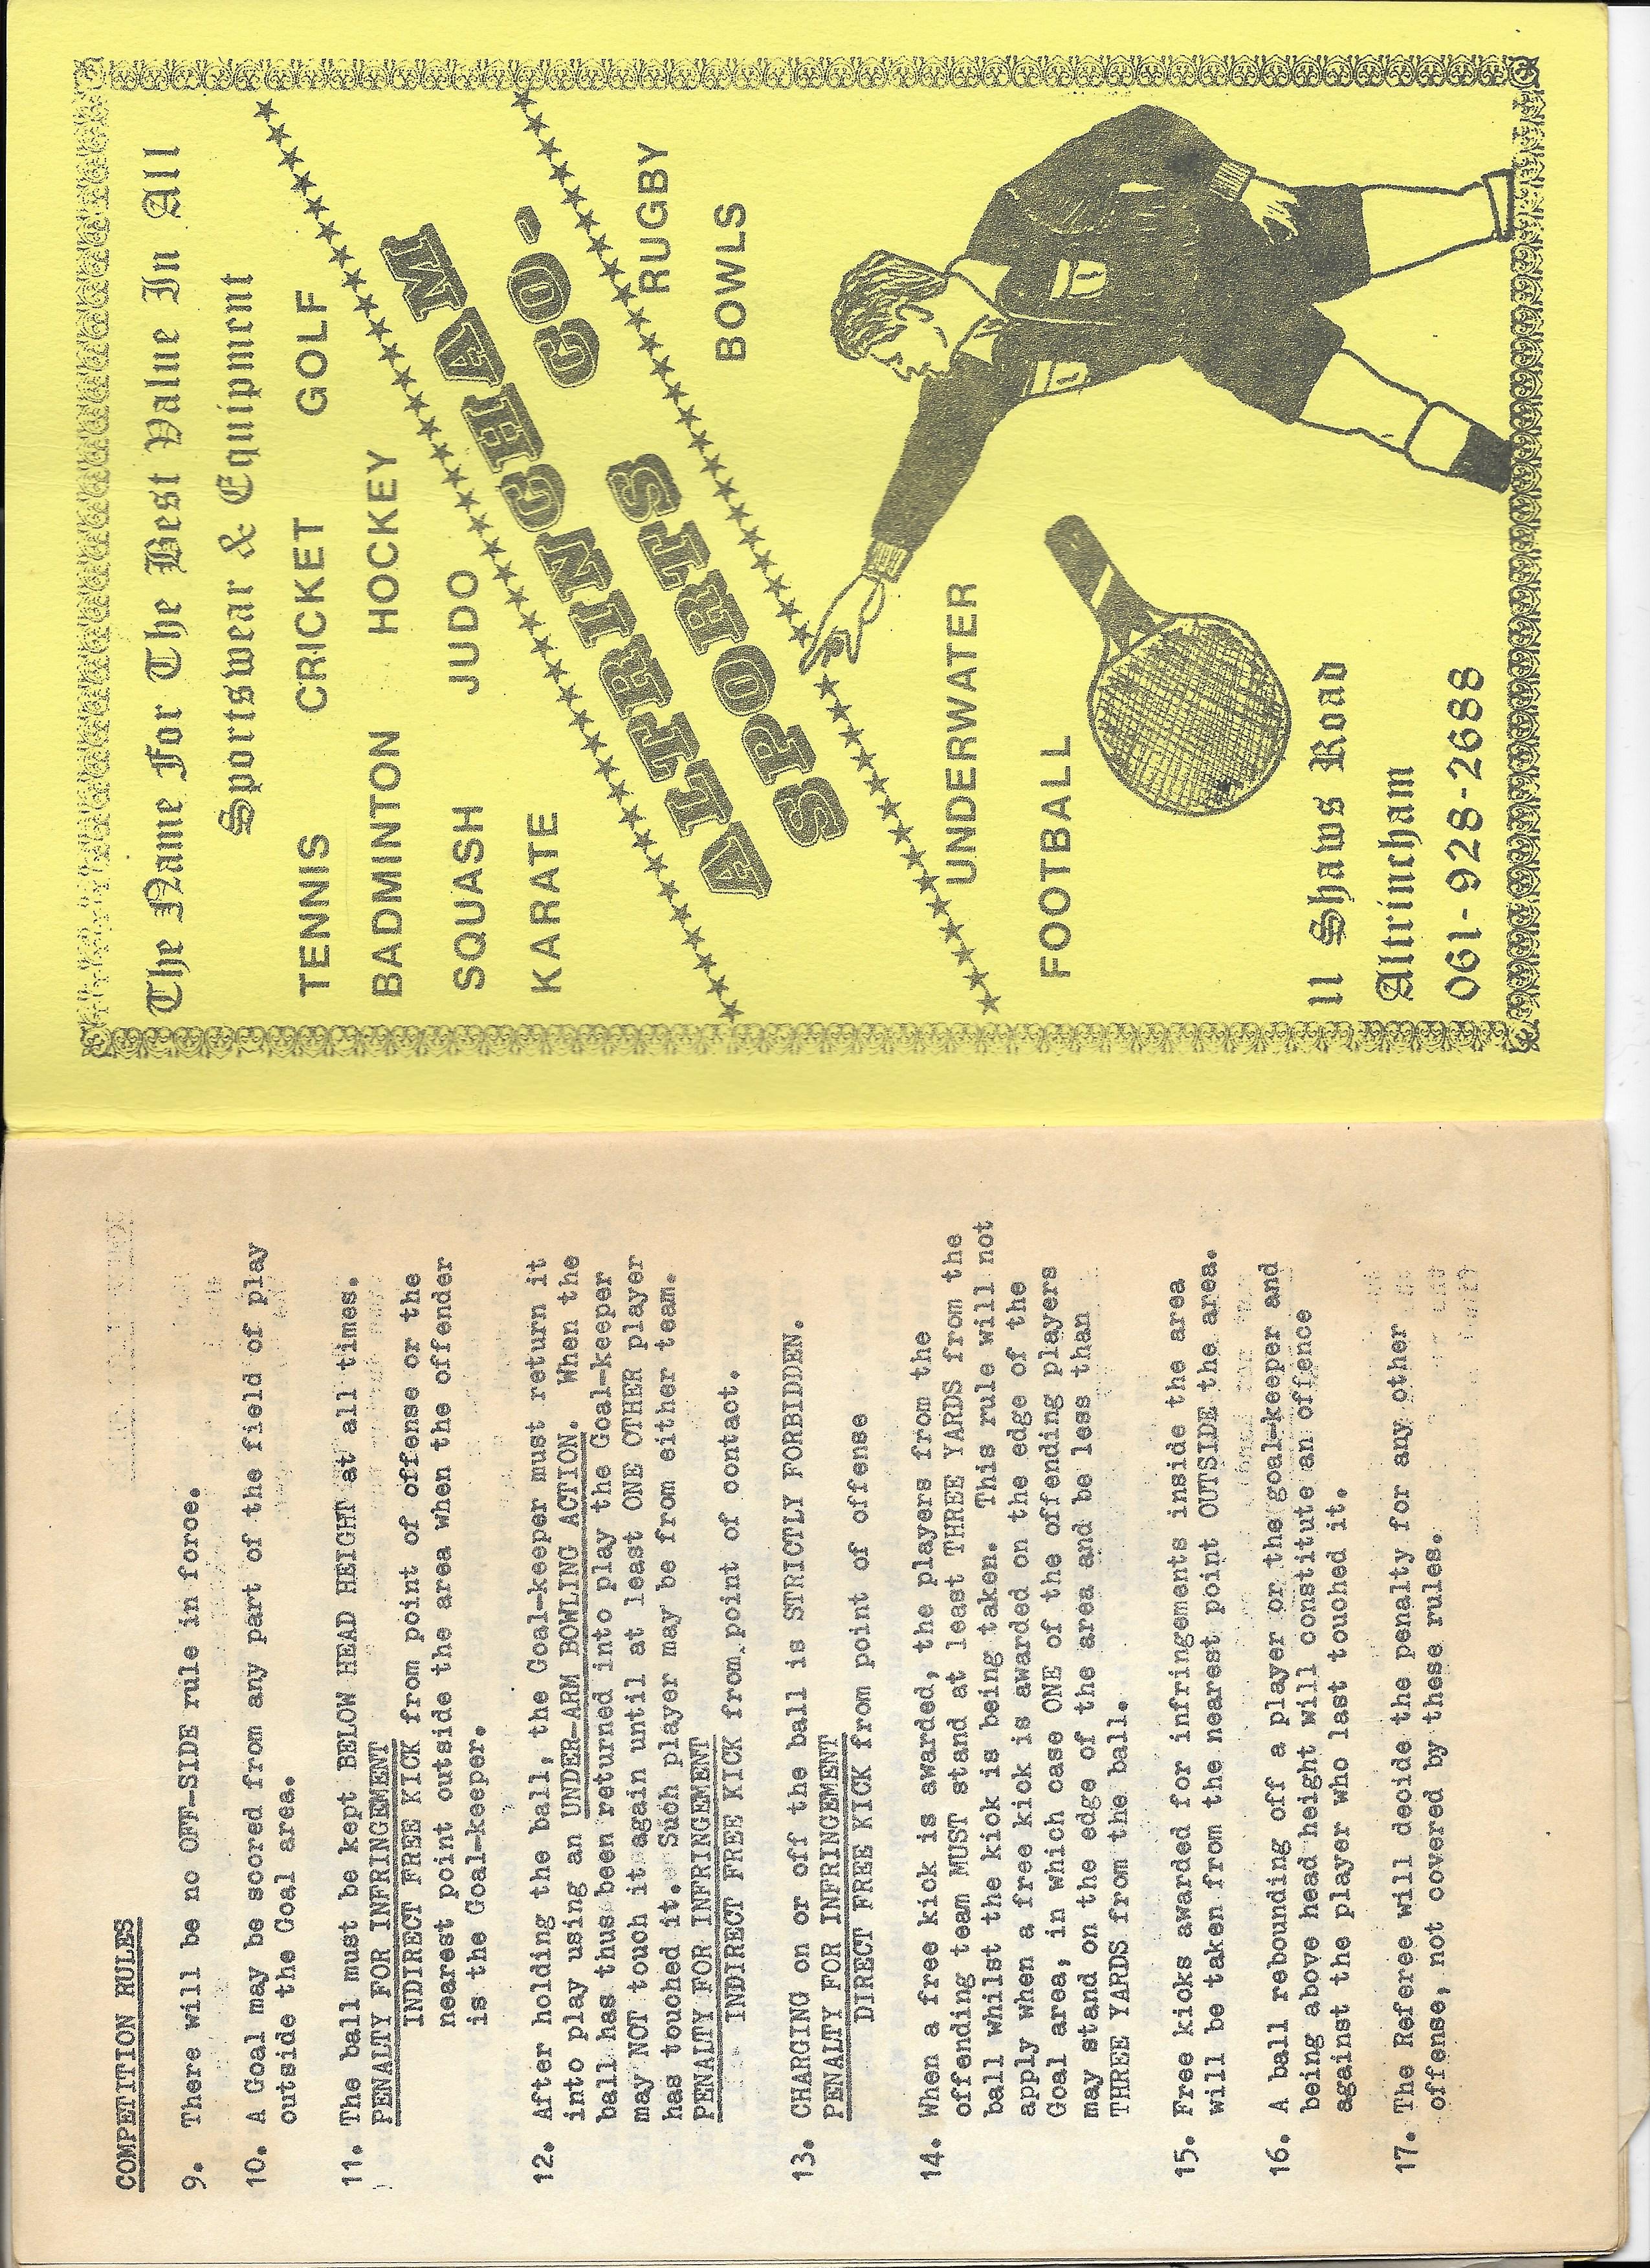 JimLawlorT&DJFL1979-10